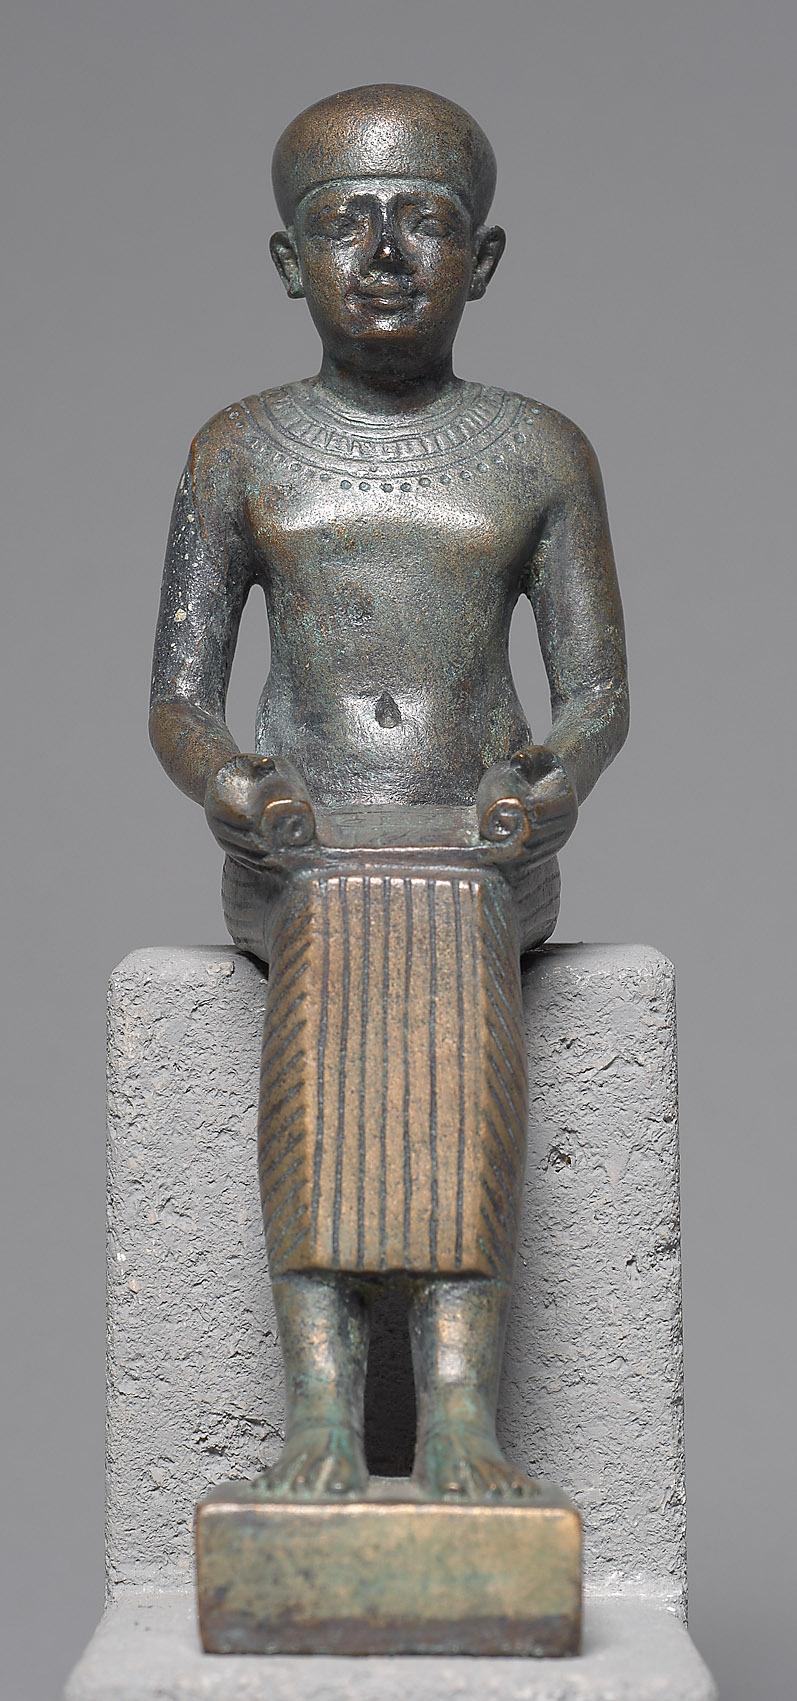 Imhotep, sitzend